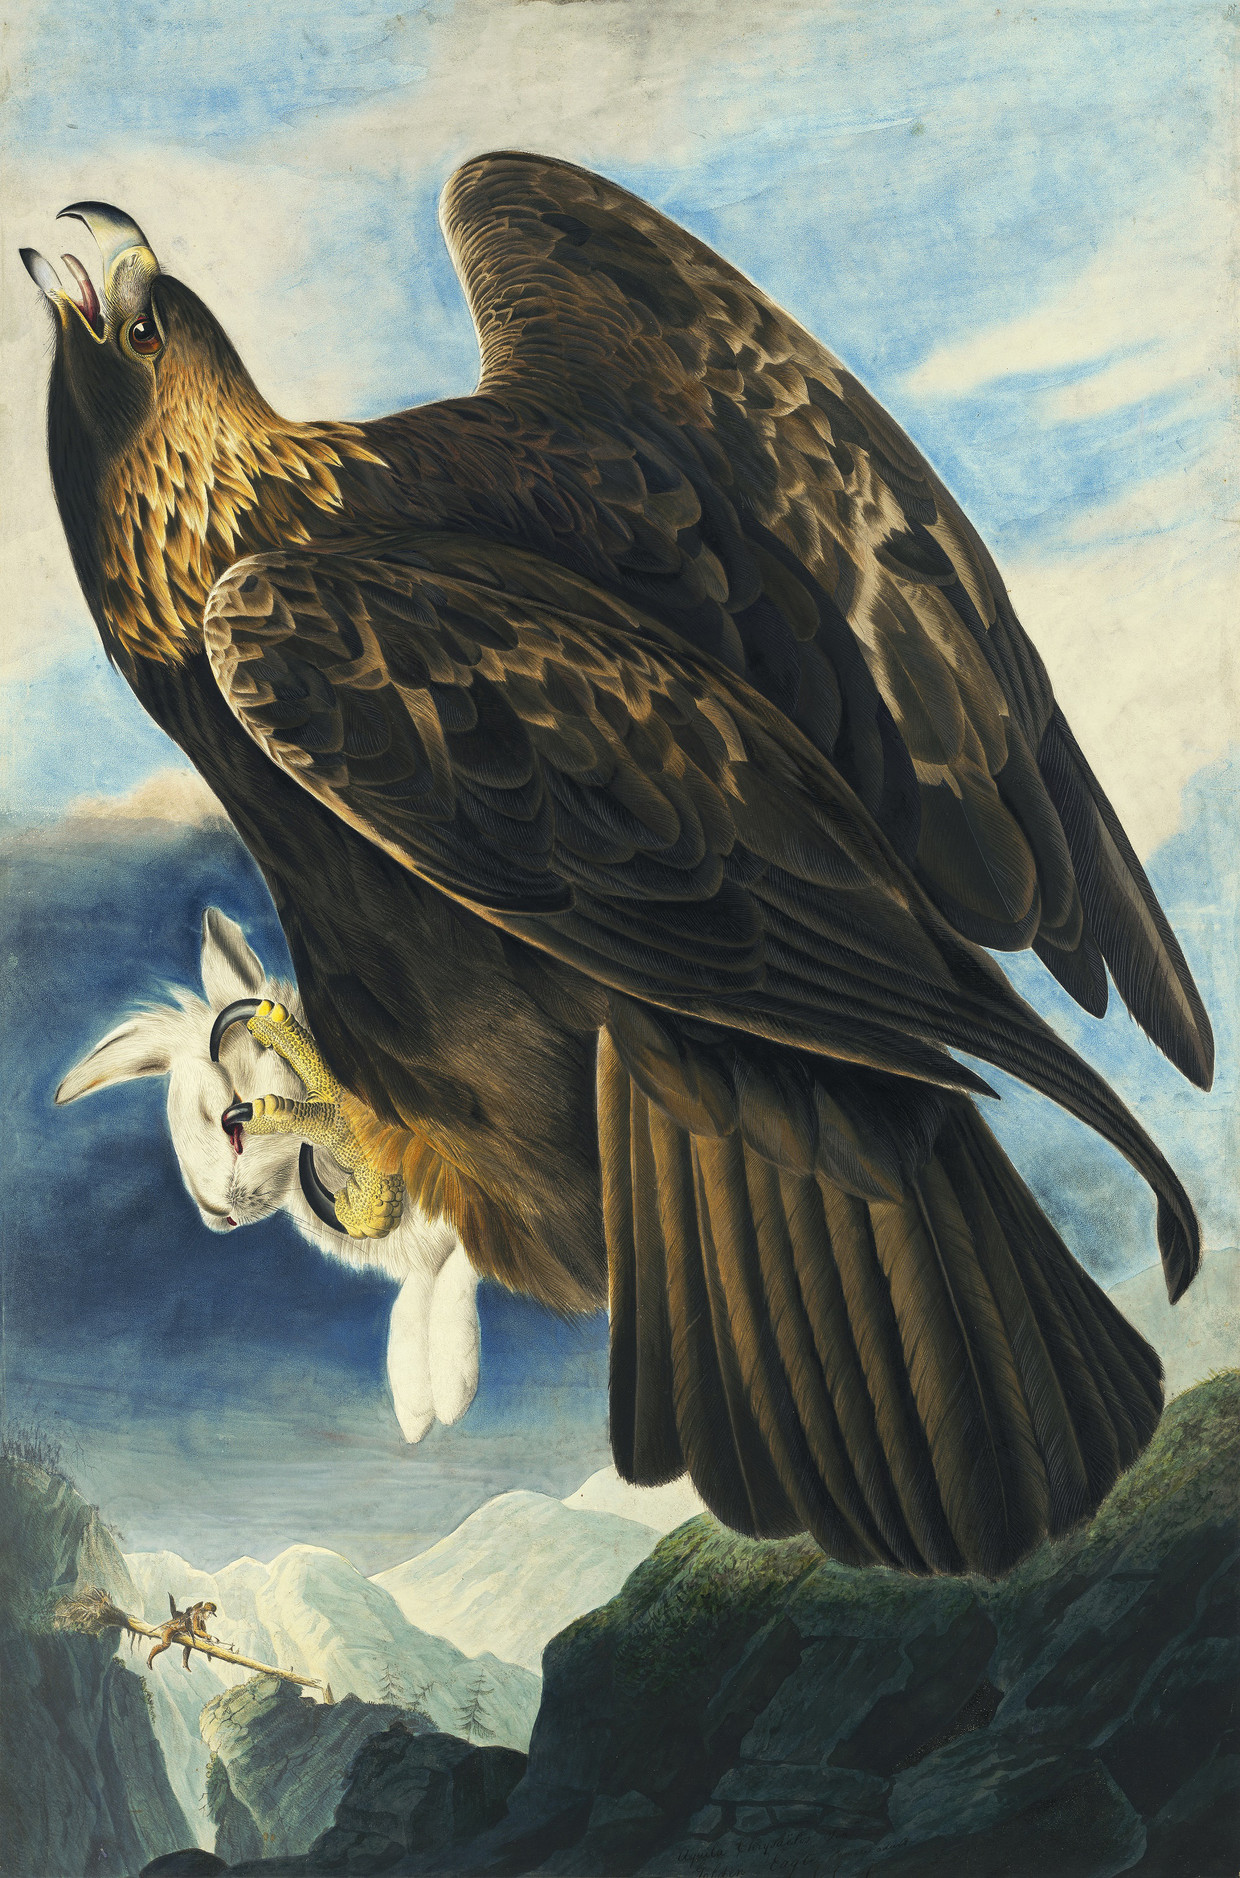 Steenarend door J.J. Audubon, 1833, Aquarel   Beeld Met dank aan The New York Historical Society, digital image created by Oppenheimer Editions